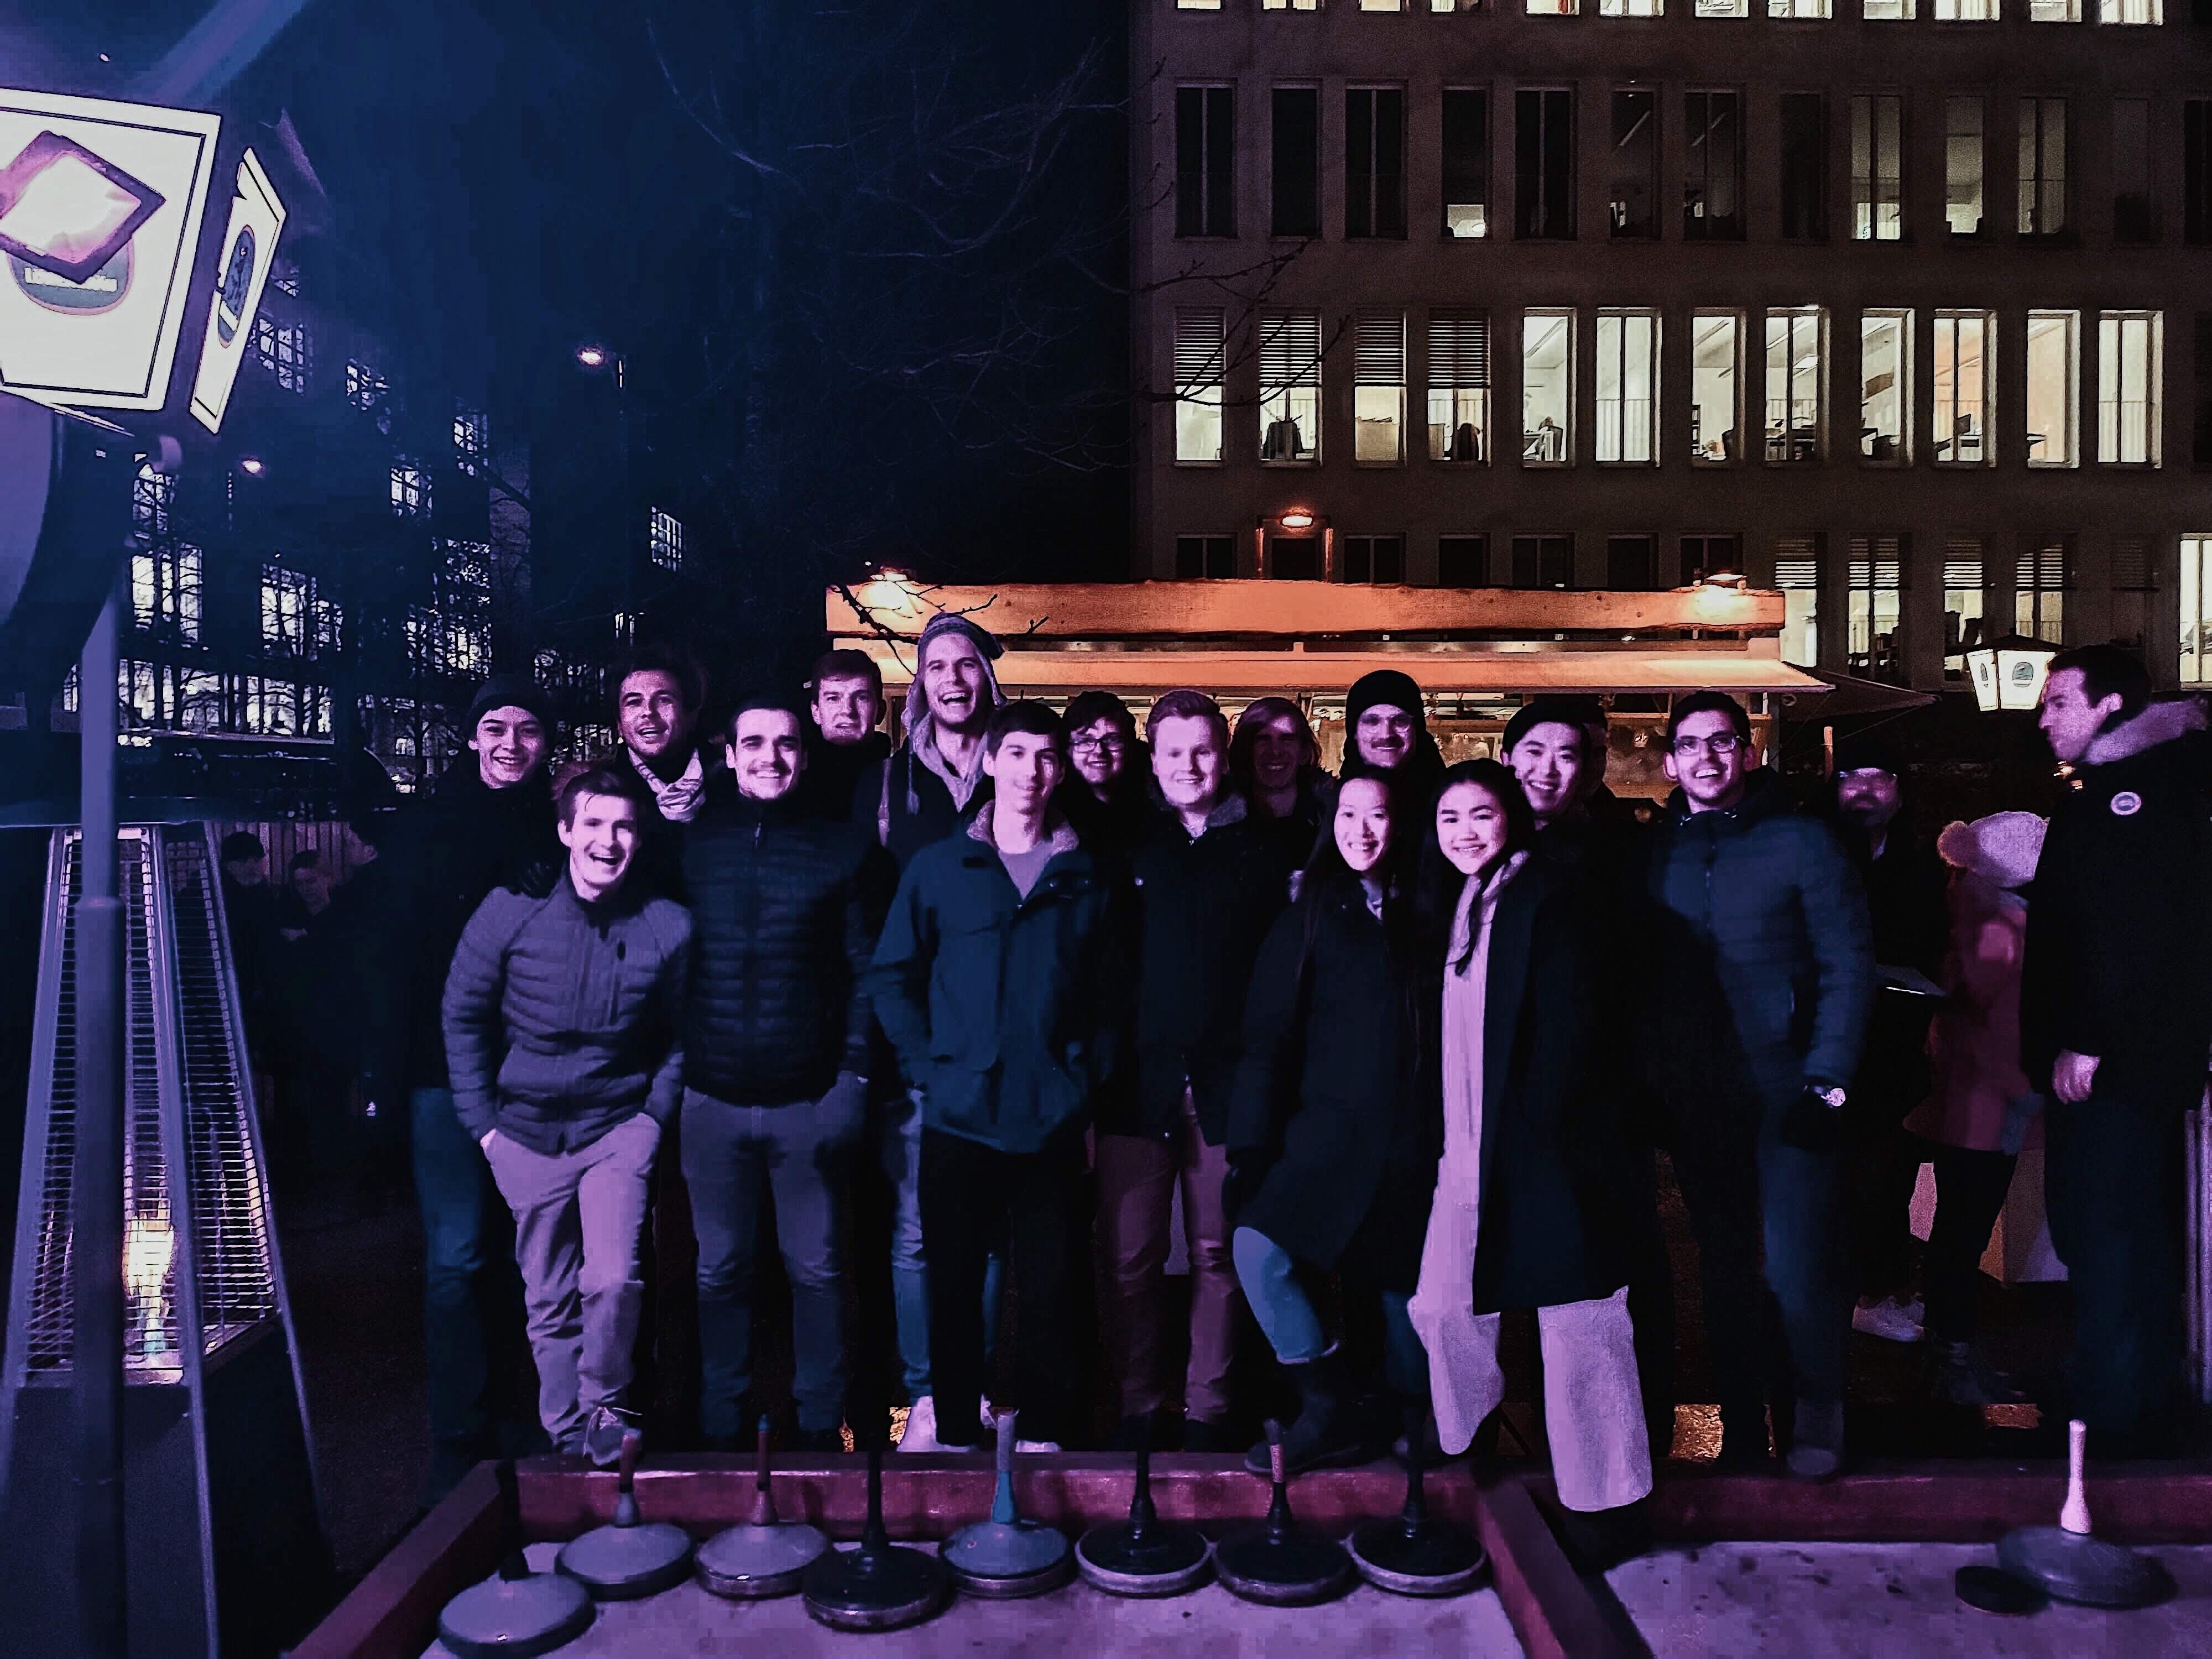 Luminovo Alumni - Being a Marketing and Growth Hacker Intern at Luminovo